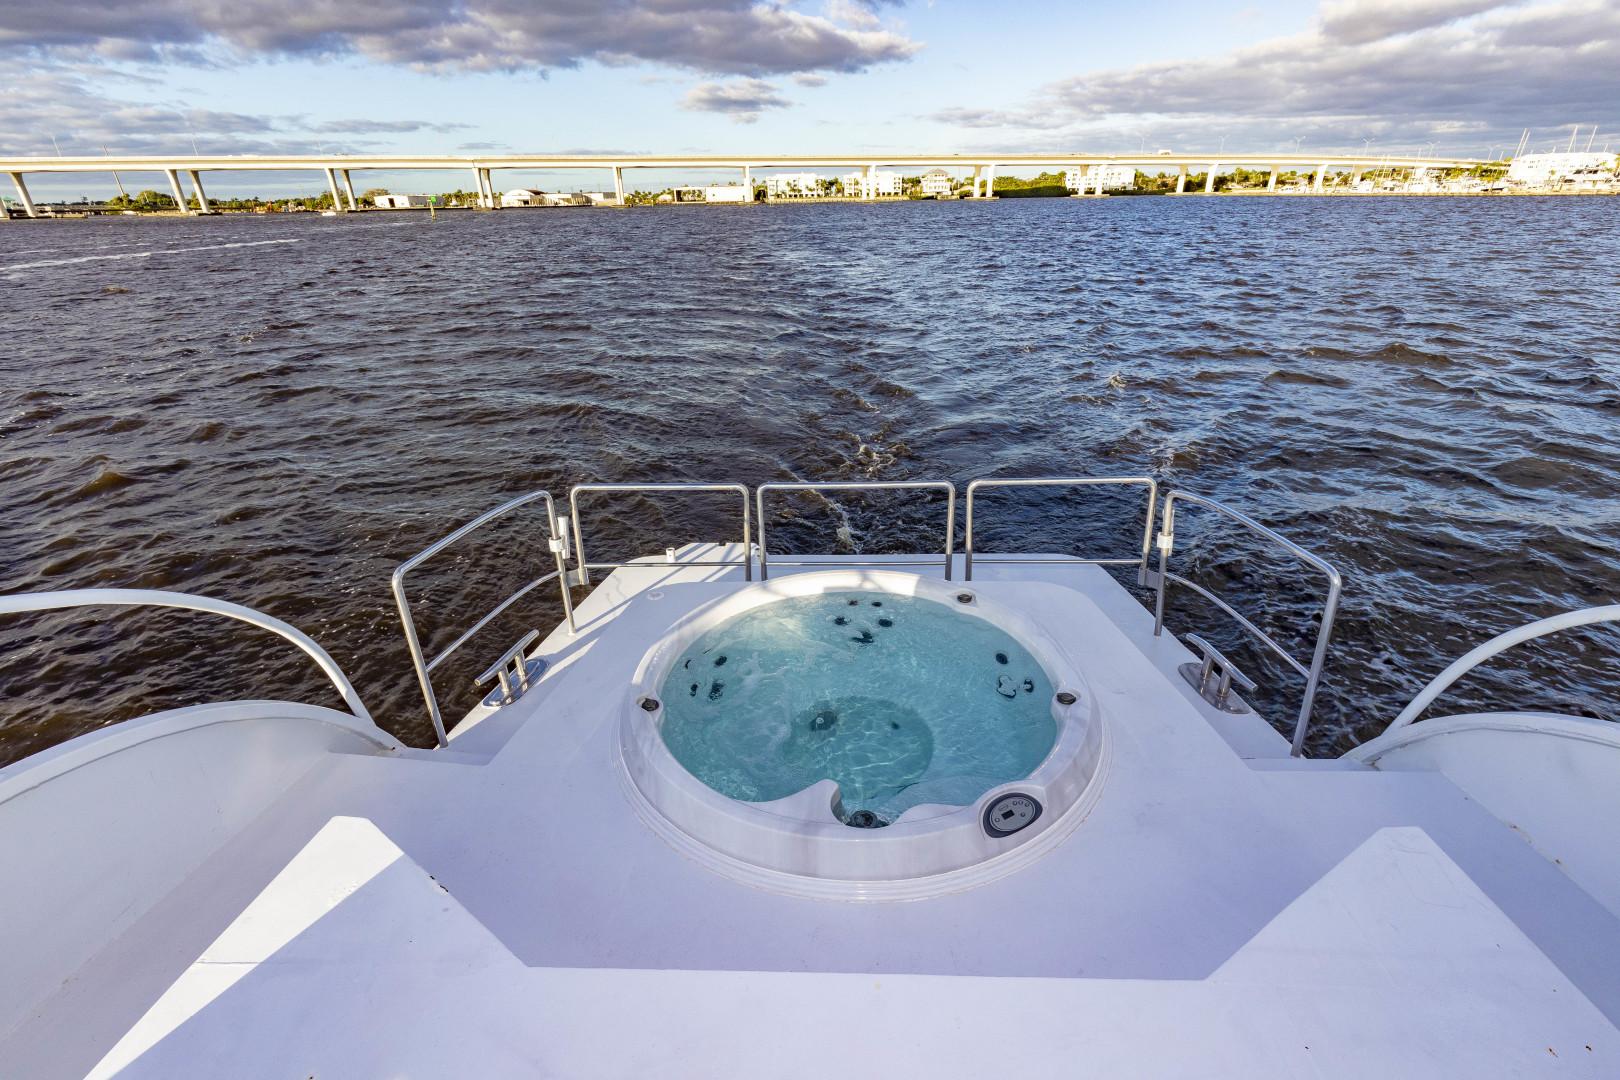 GlassTech-Expedition Yacht 2018-Reset Stuart-Florida-United States-Swim Deck-1568639 | Thumbnail